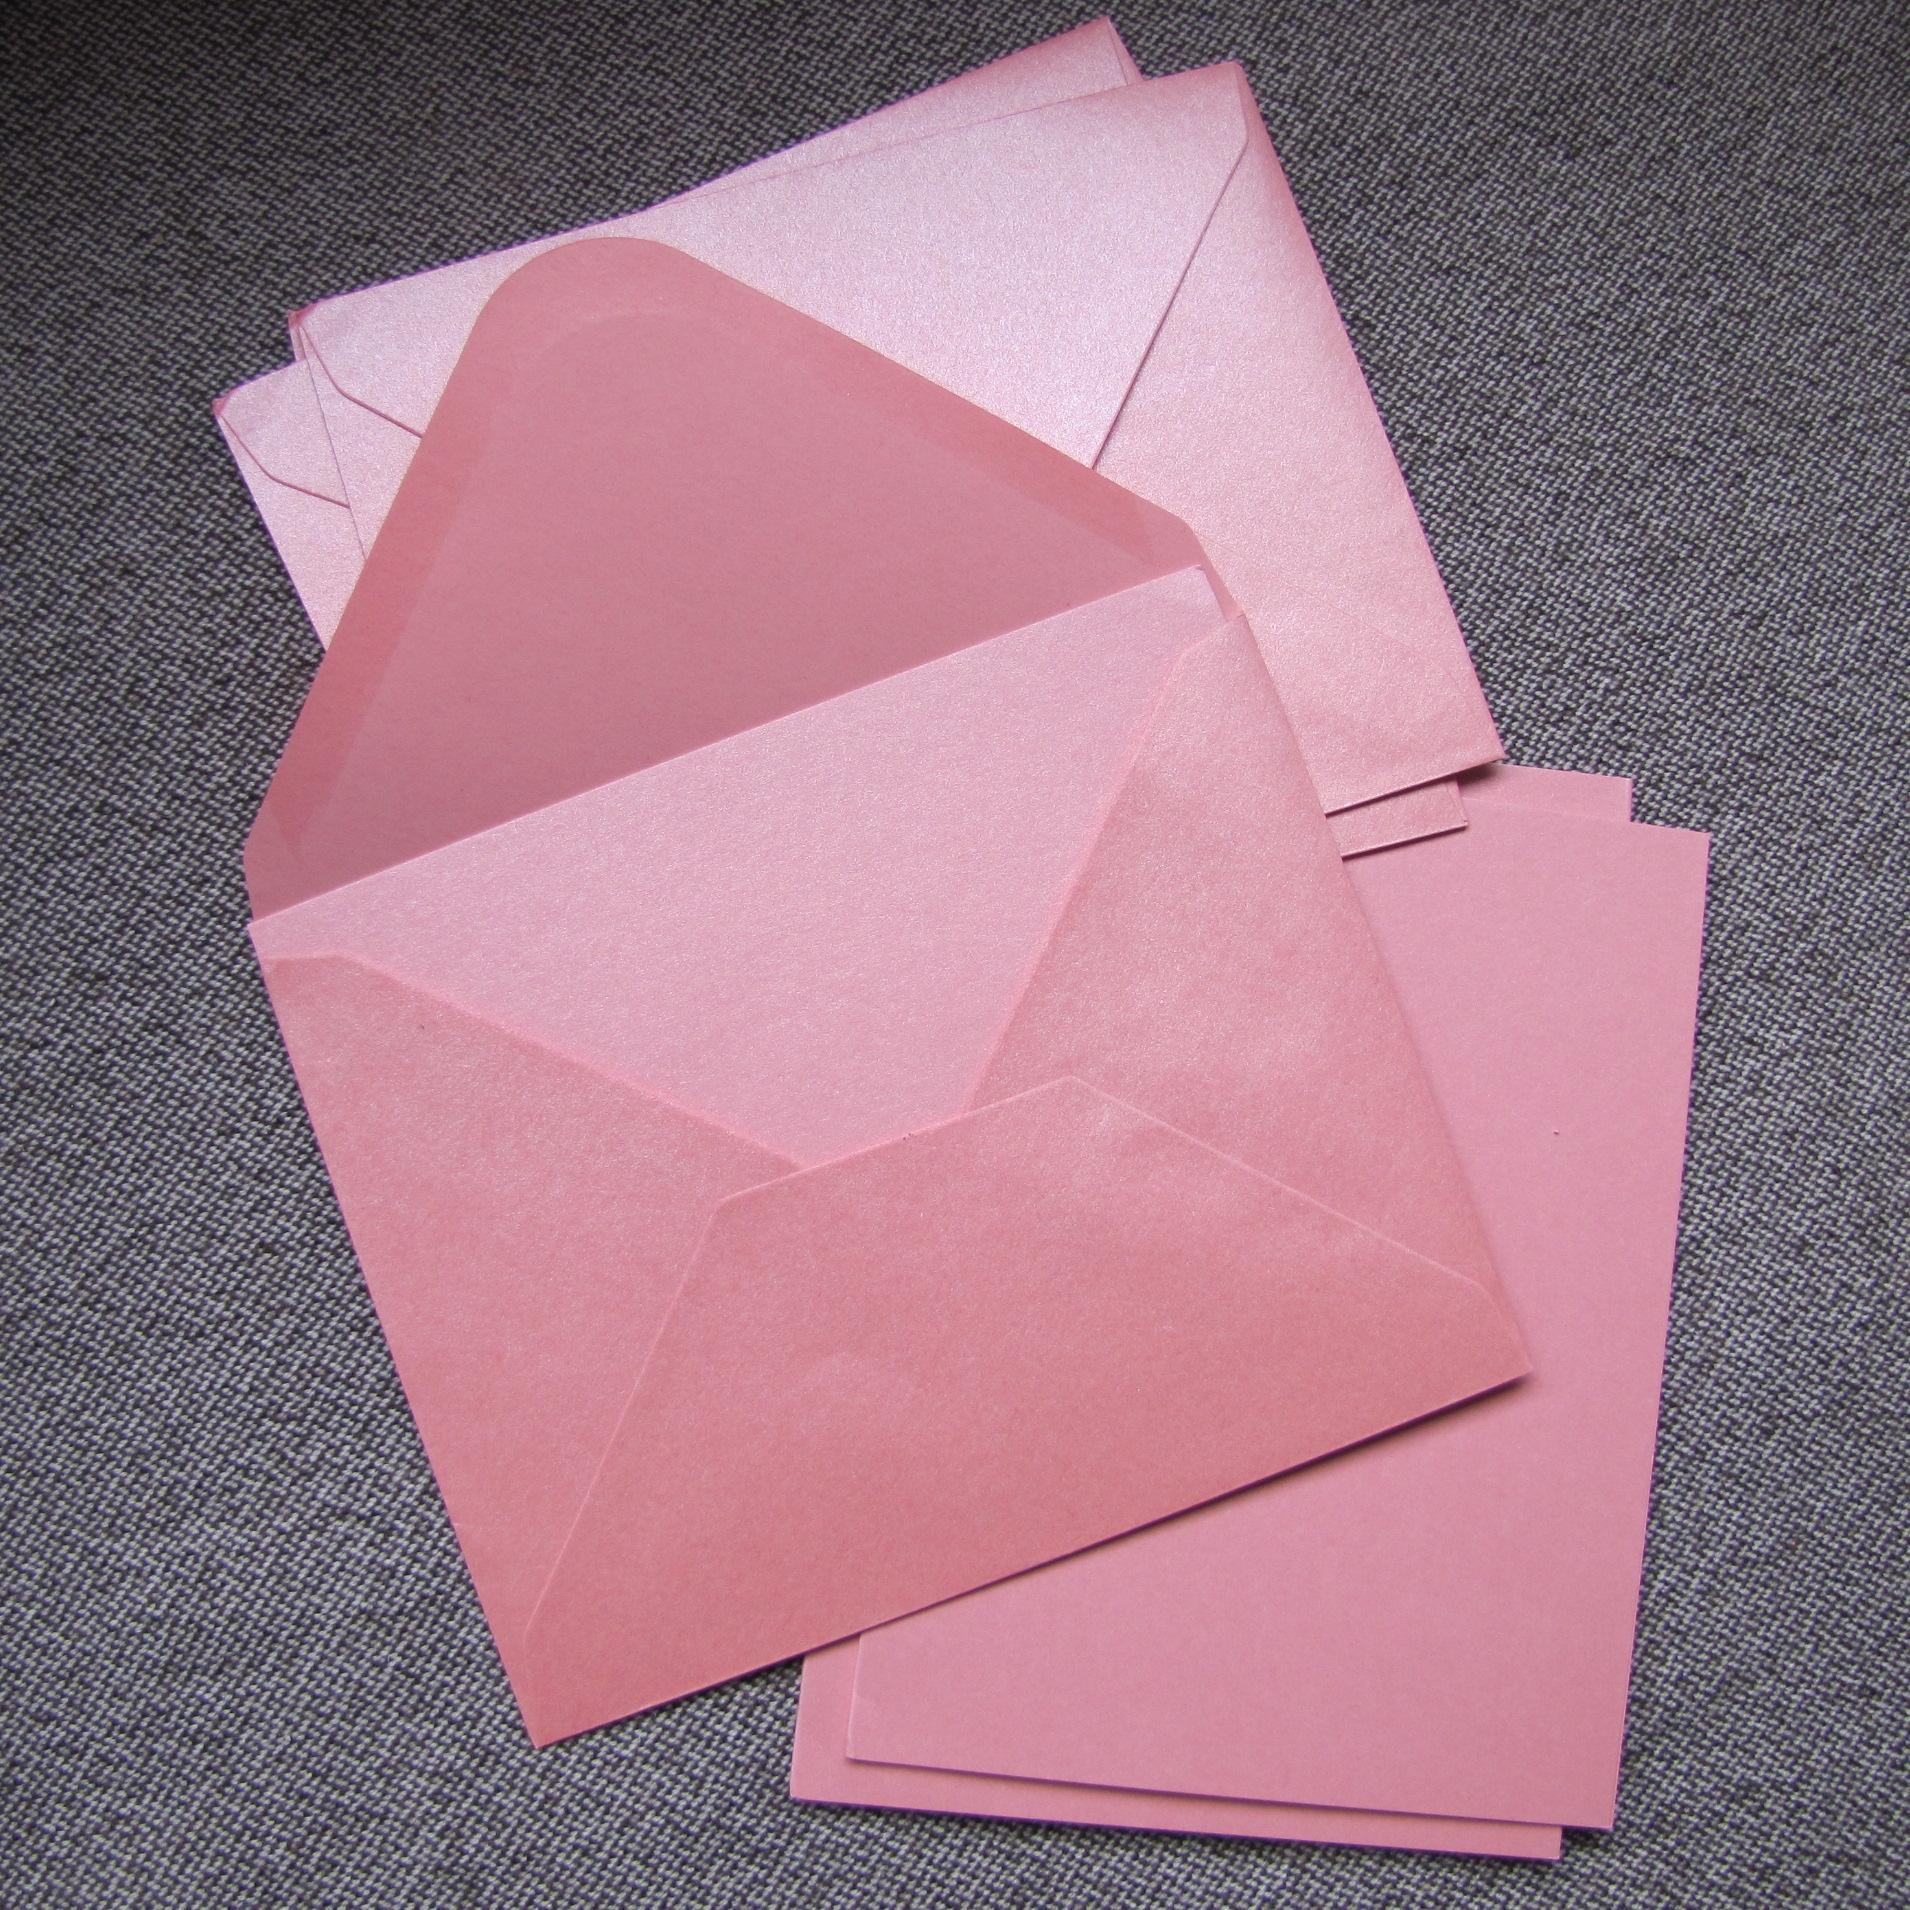 enveloppe rose carte